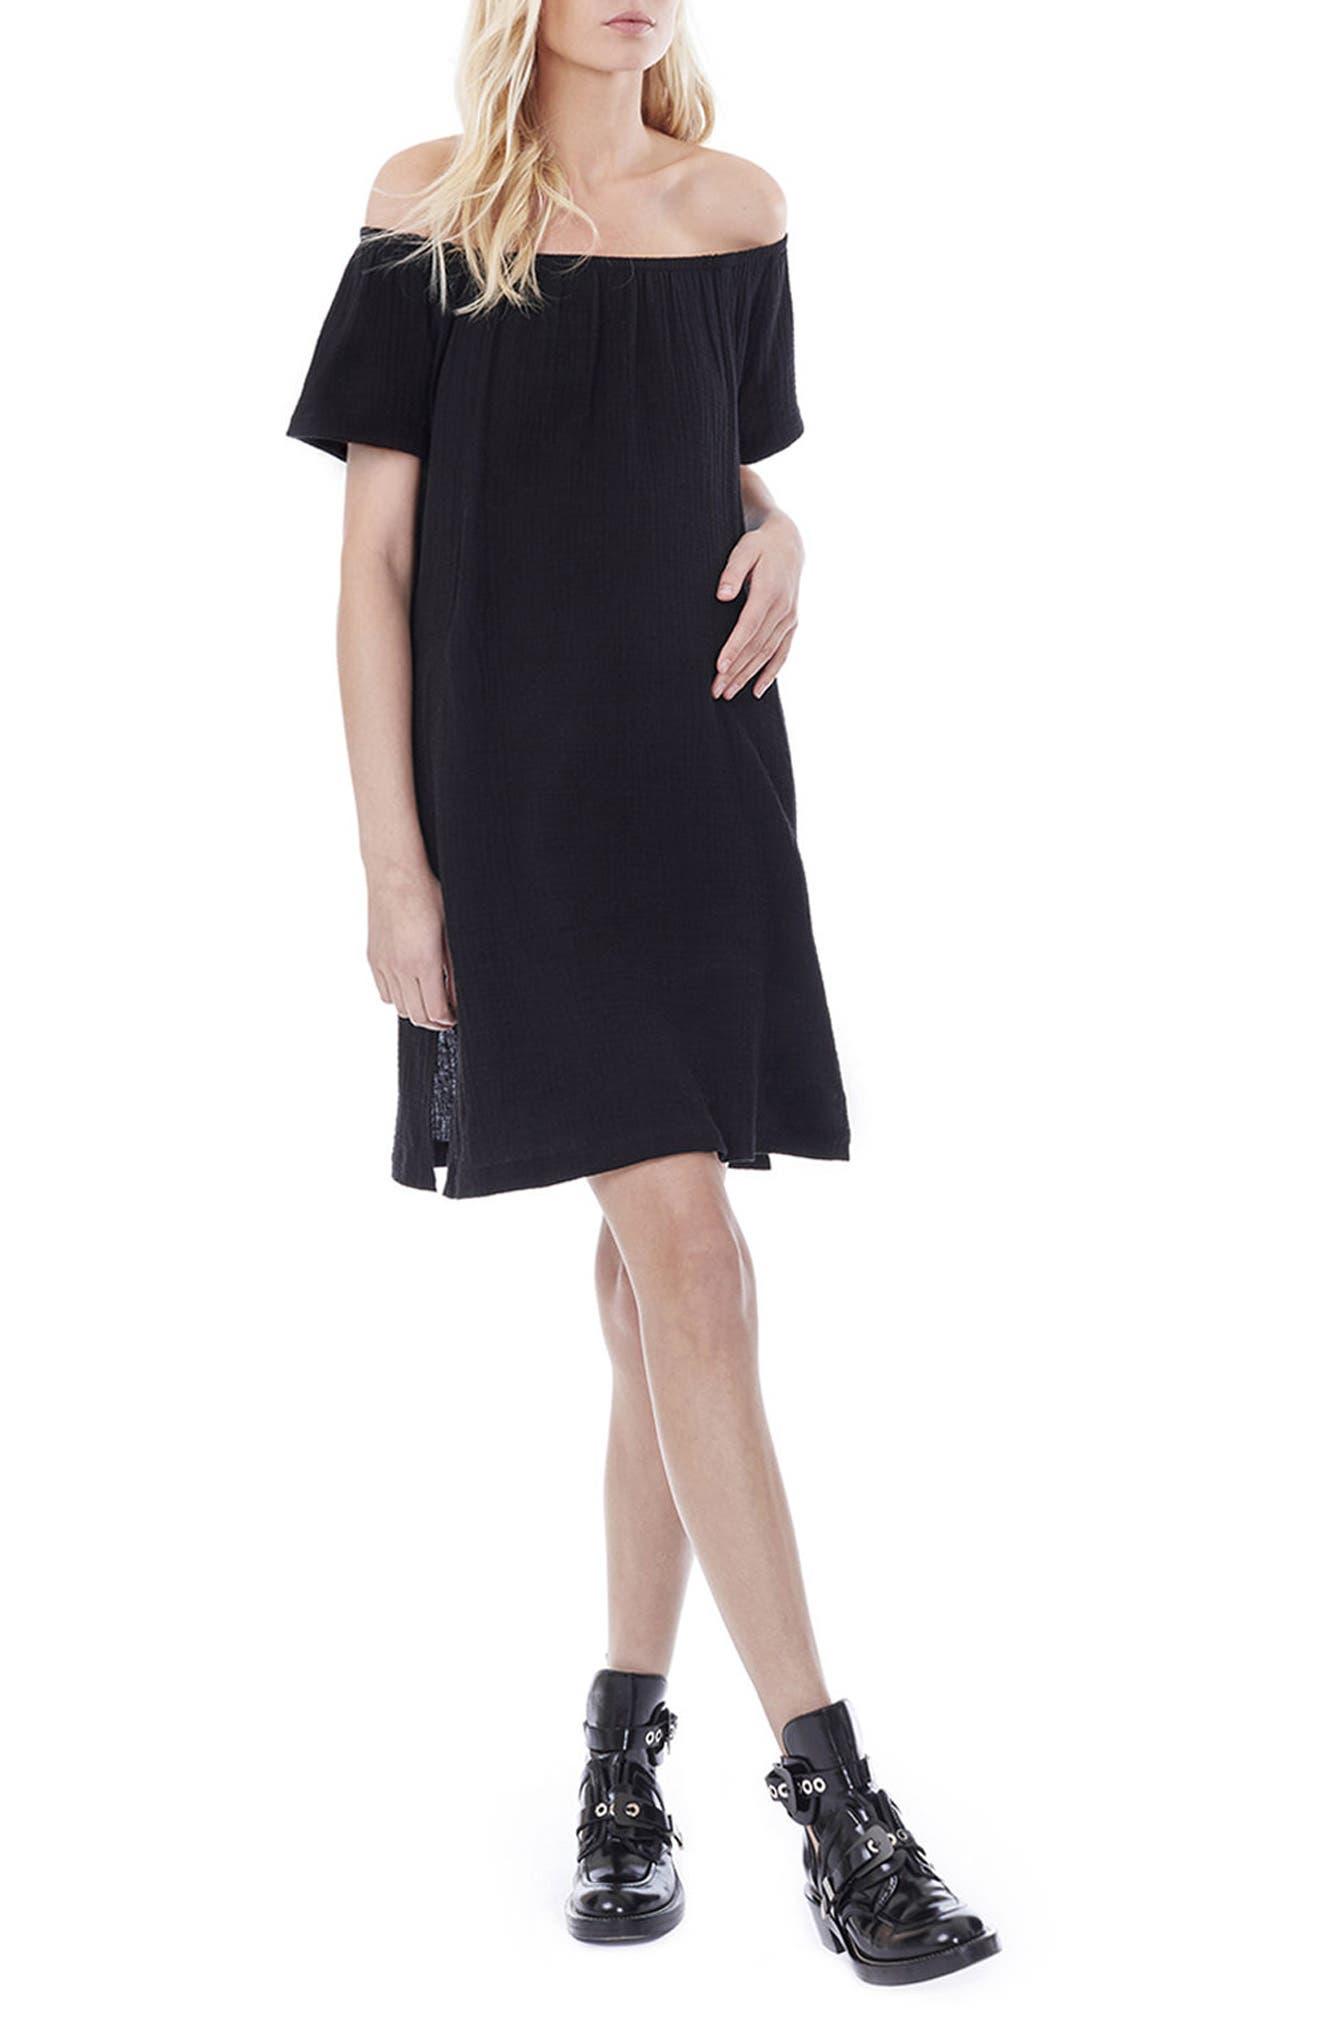 LOYAL HANA, Ariel Off The Shoulder Maternity/Nursing Dress, Main thumbnail 1, color, BLACK